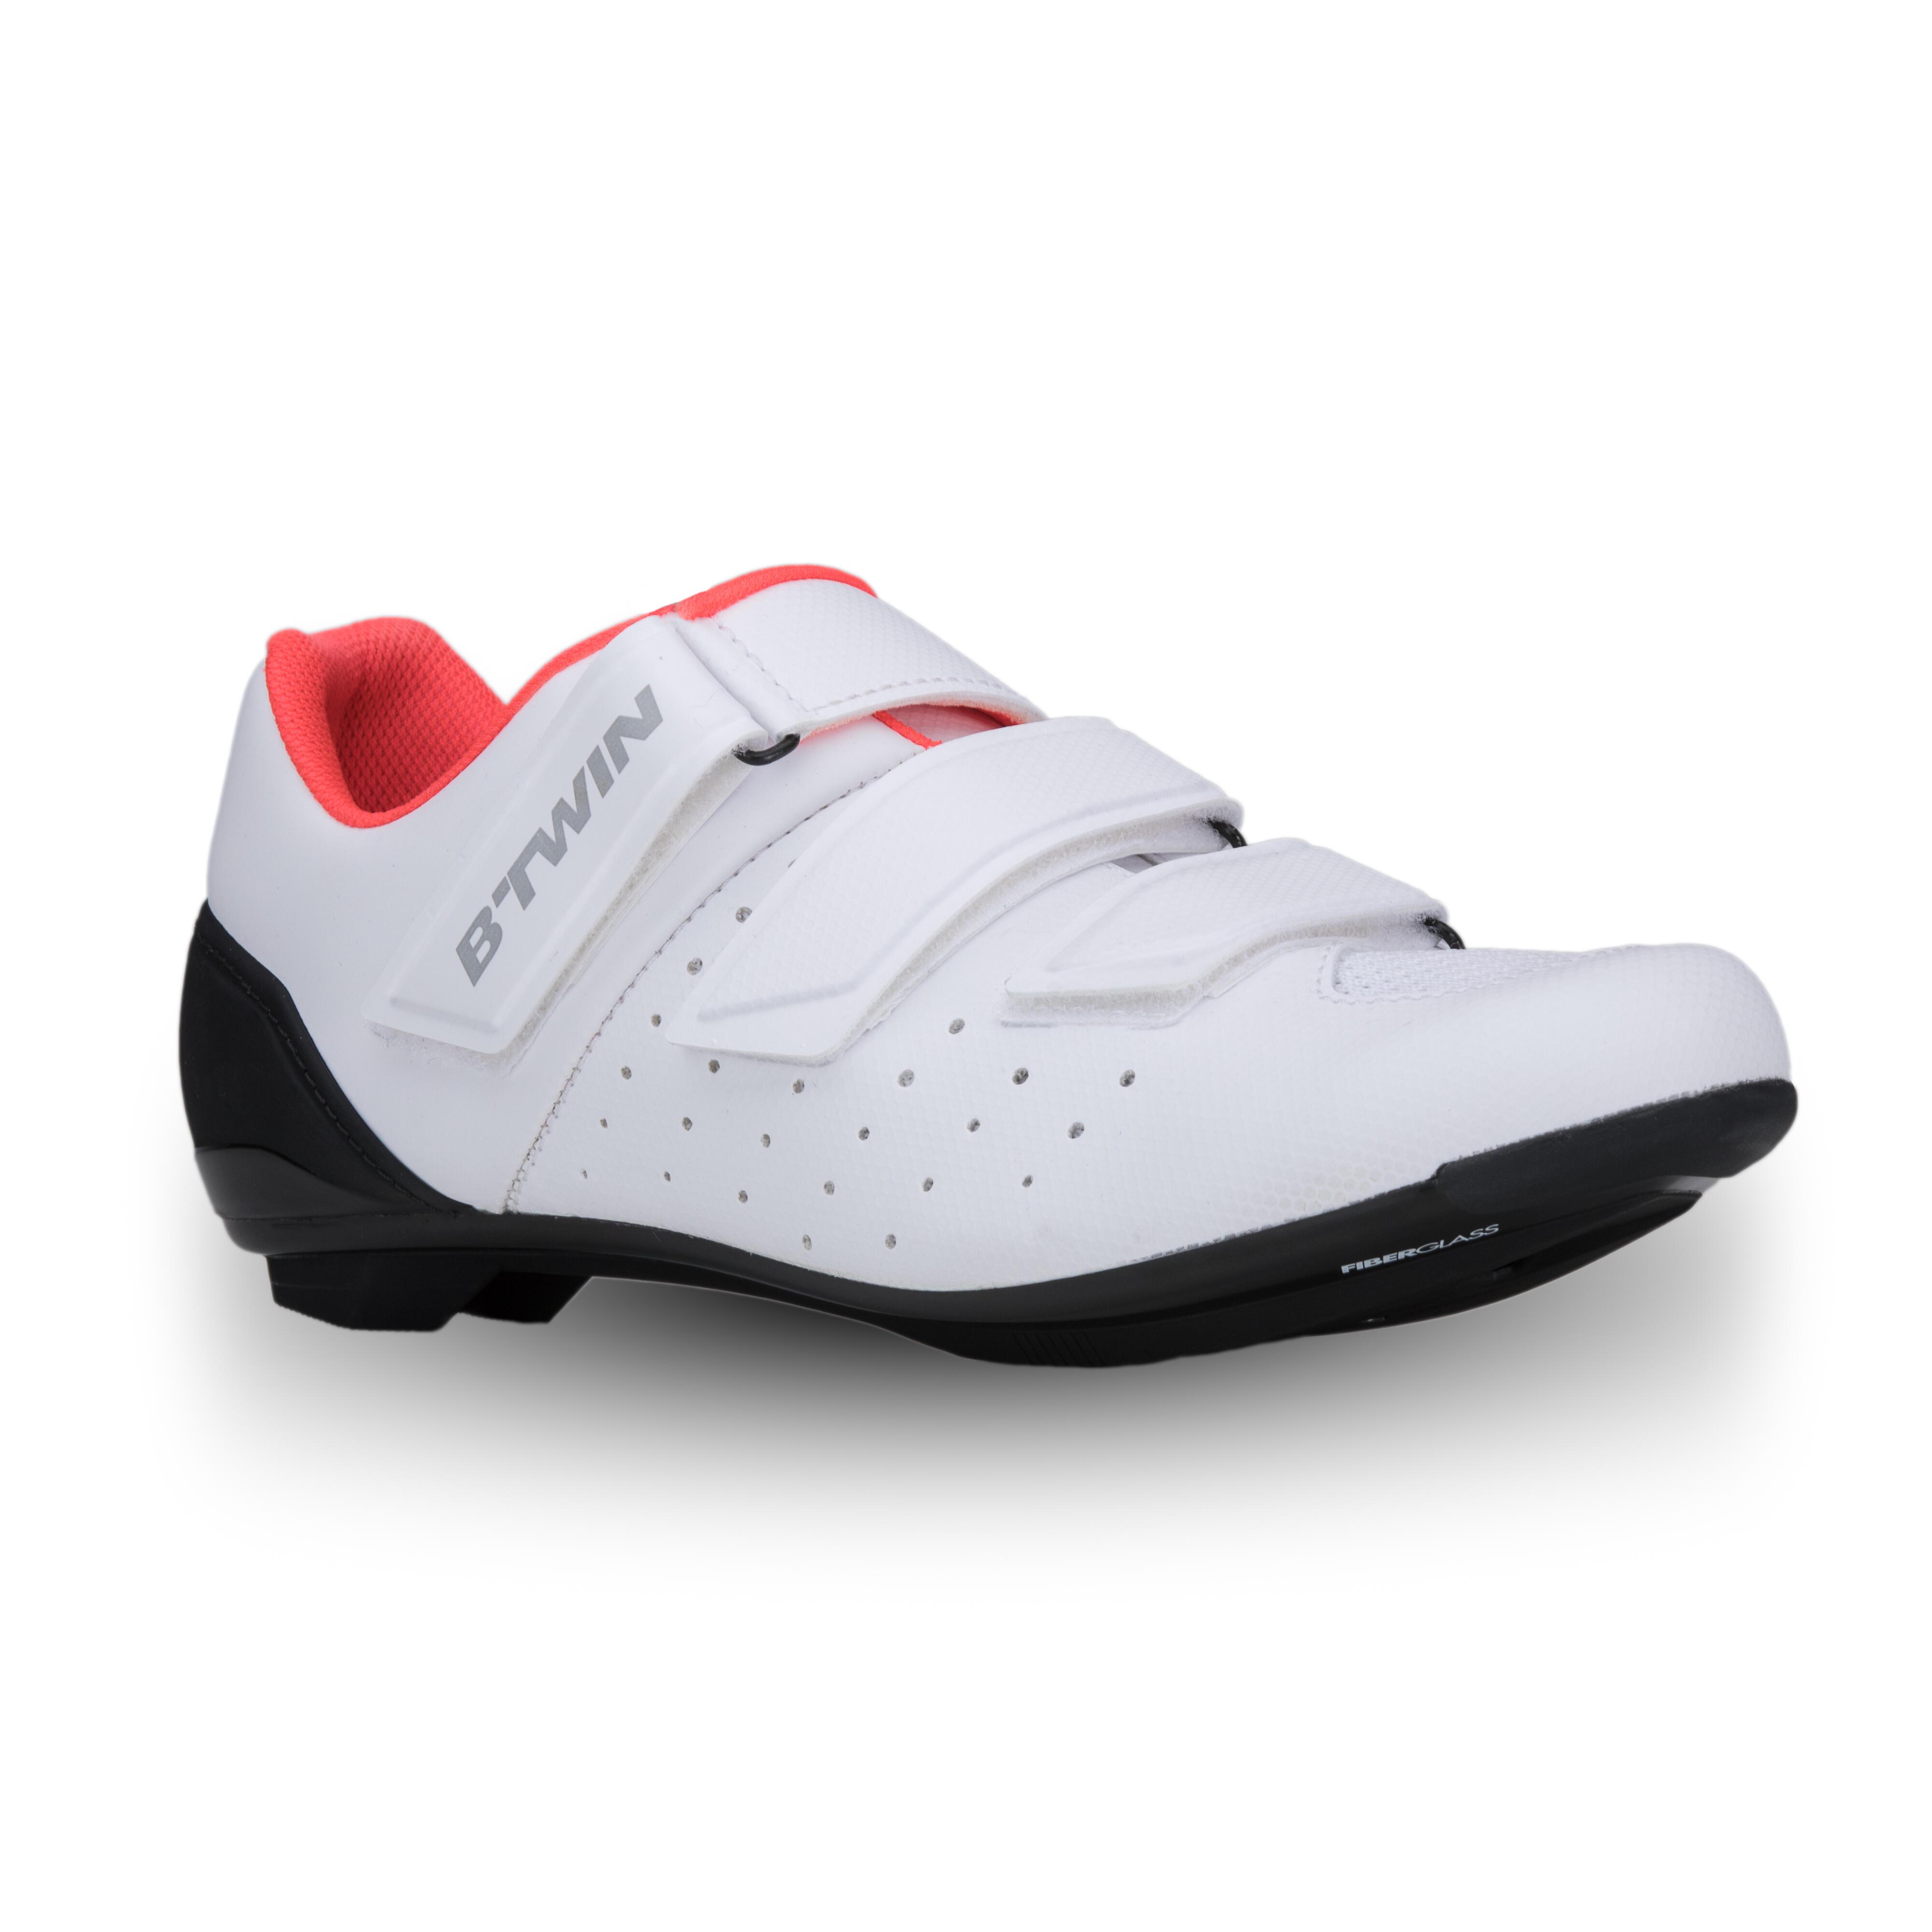 Chaussures vélo route Cyclosport 500 ROSE BLANC - Van rysel